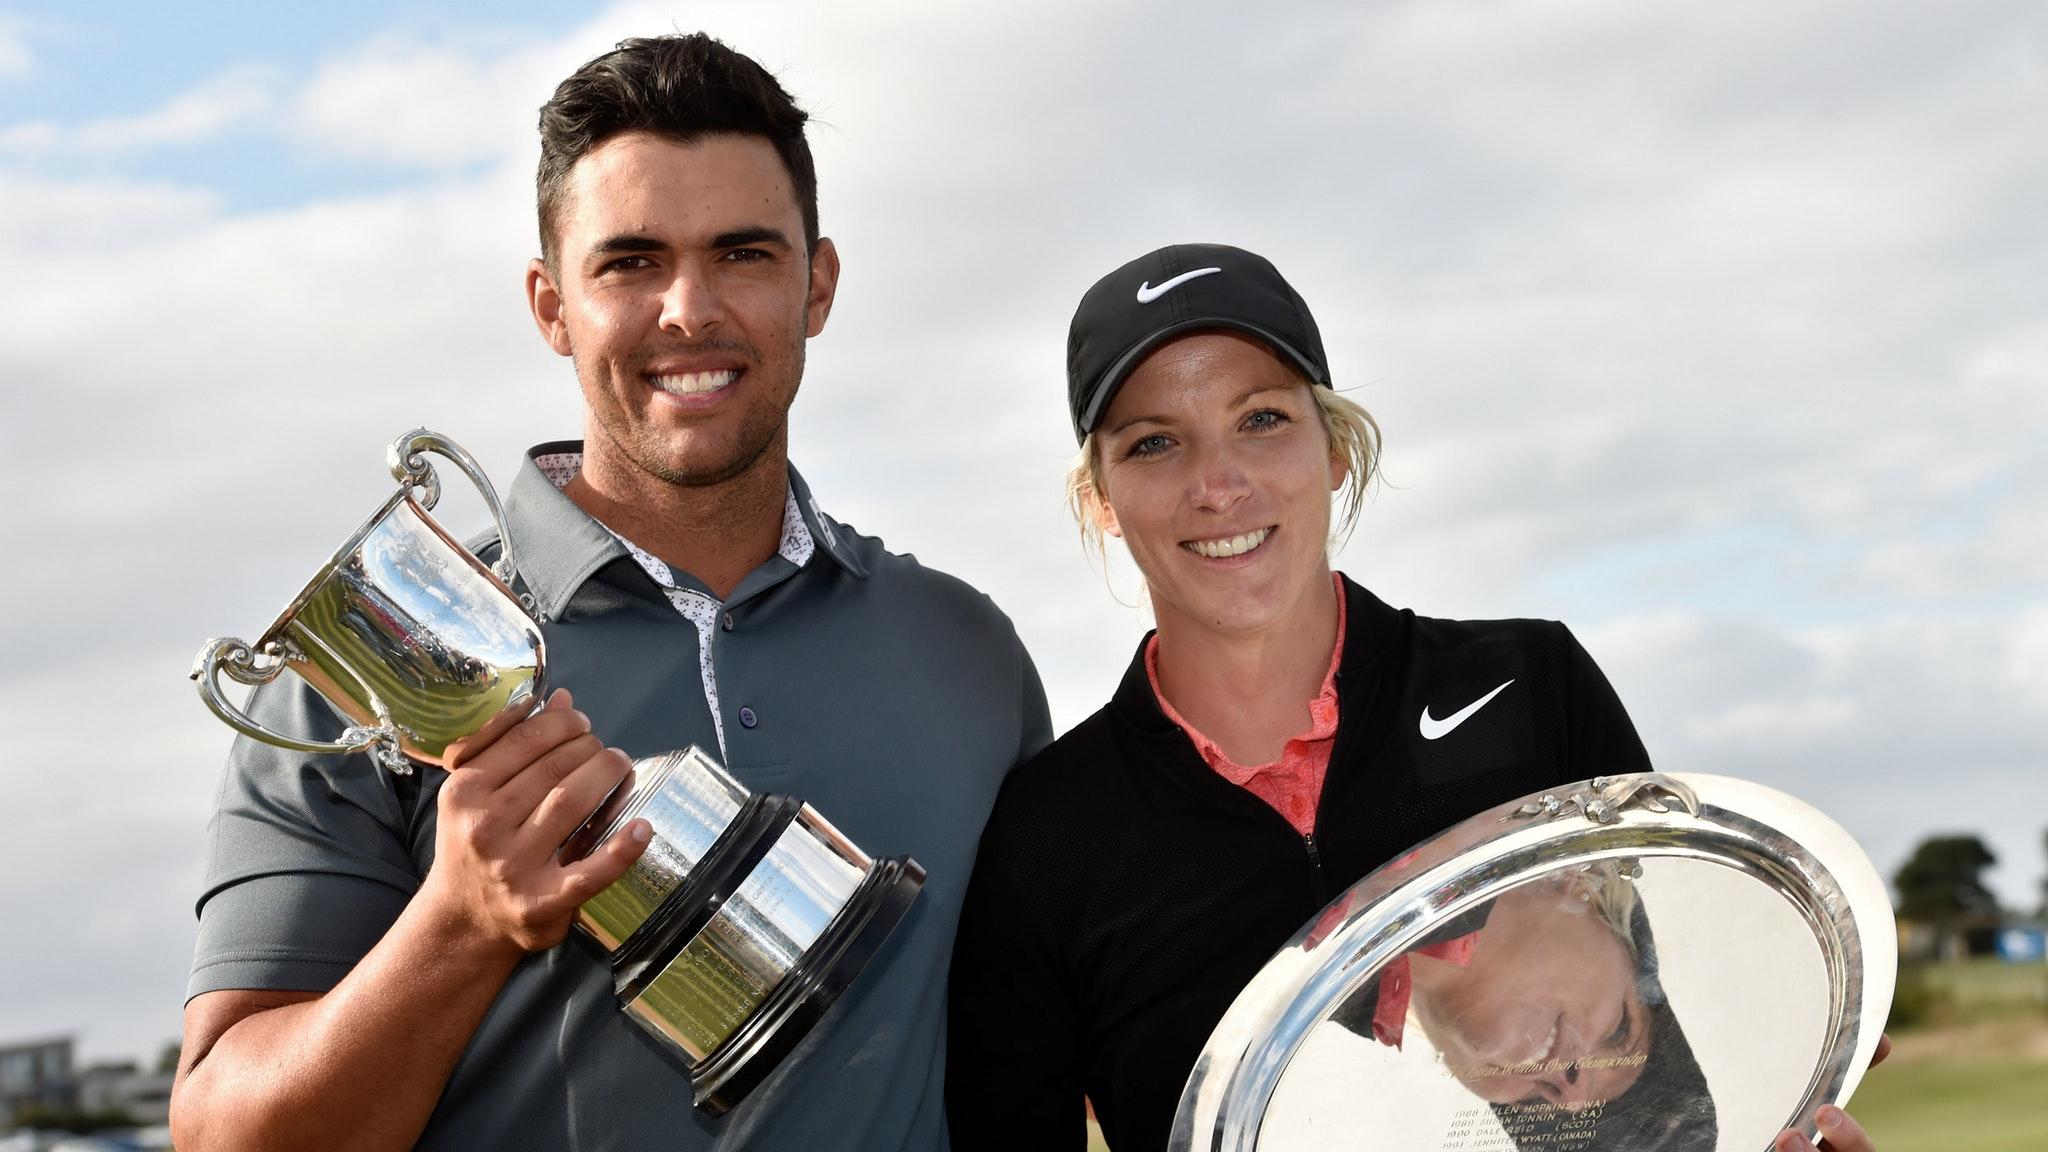 2017 Champions Dimi Papadatos & Mel Reid